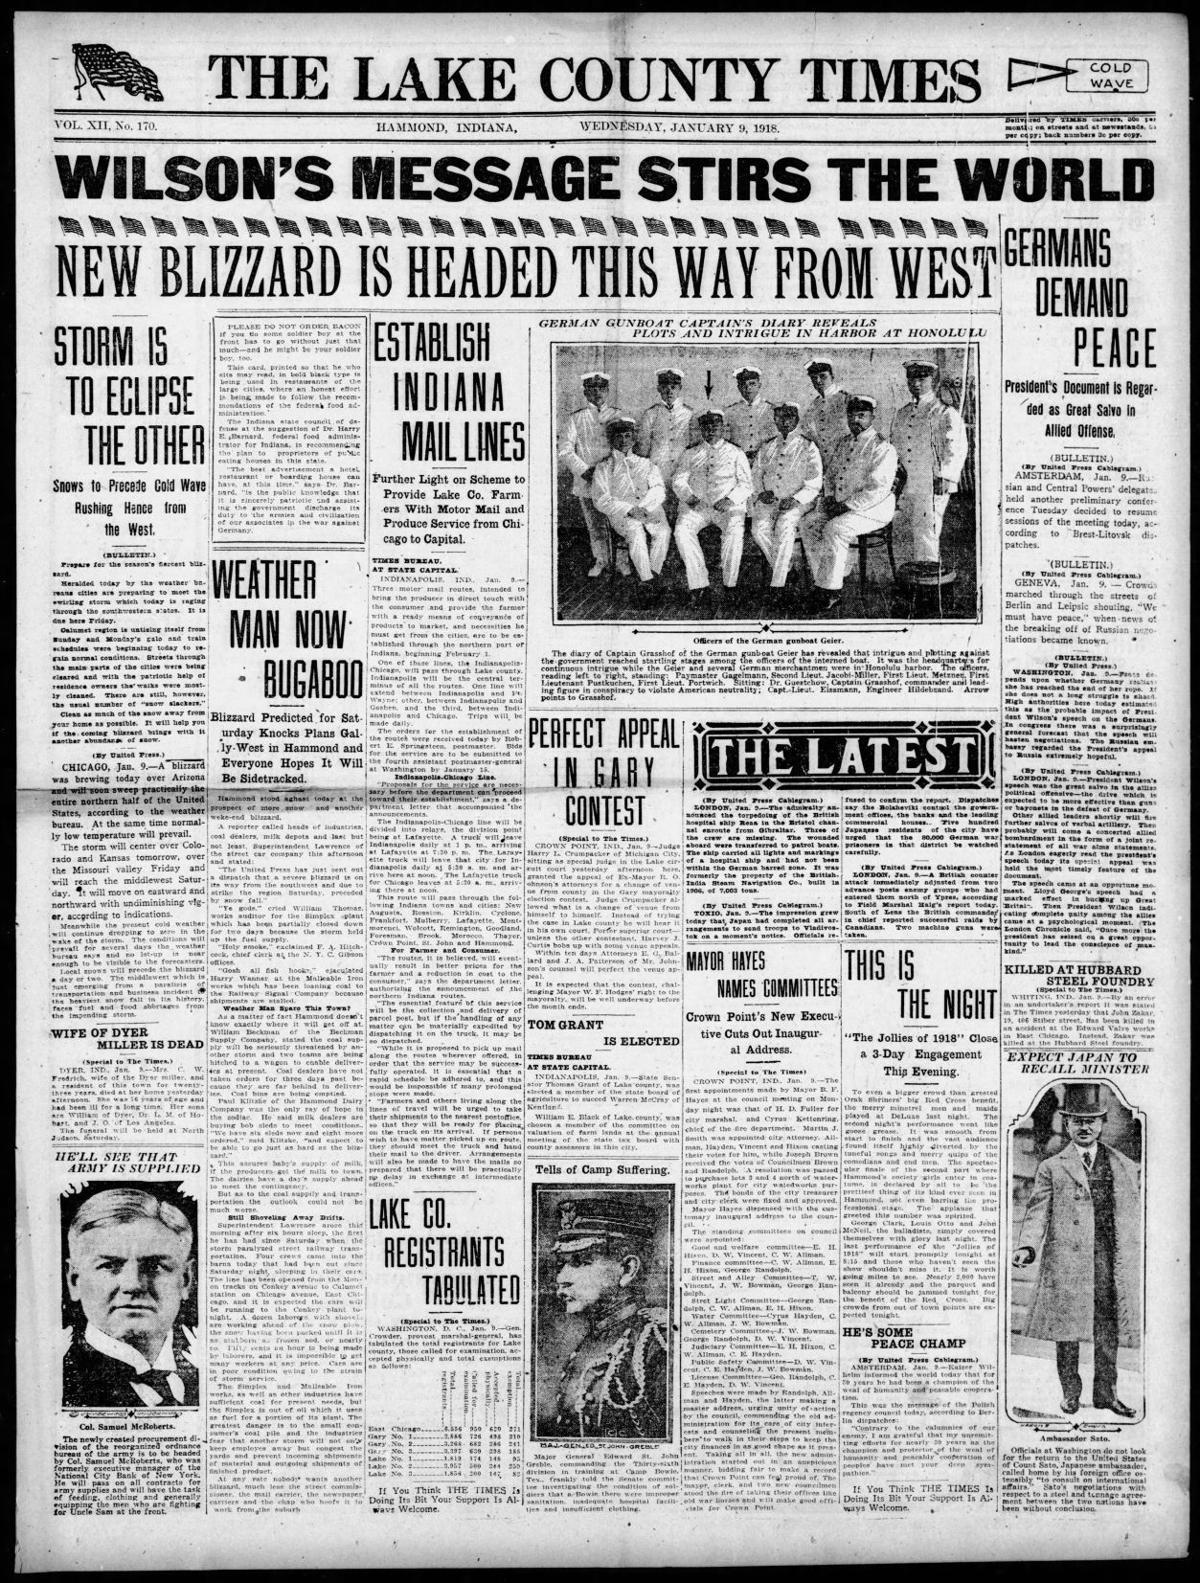 Jan. 9, 1918: Establish Indiana Mail Lines